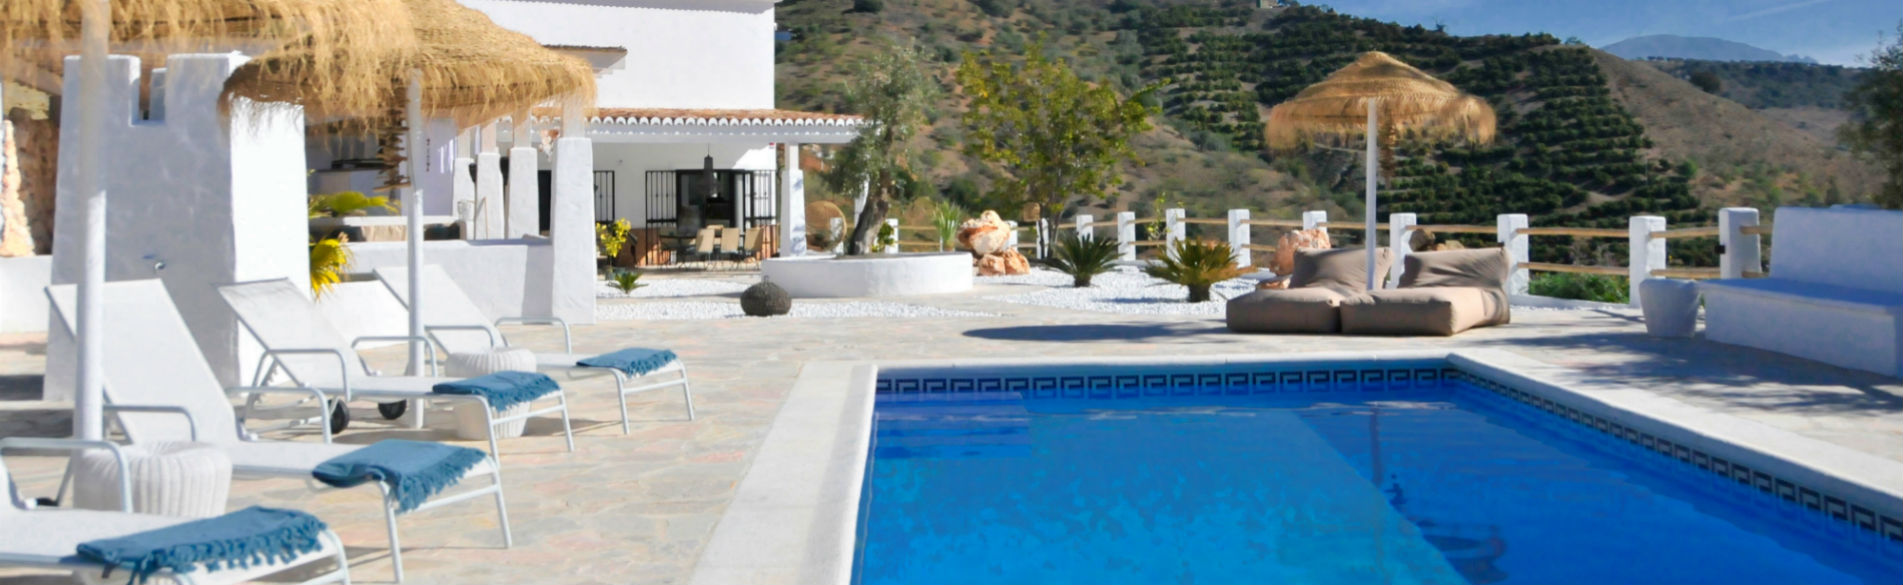 Villa Pepita Andalusie - zwembad home